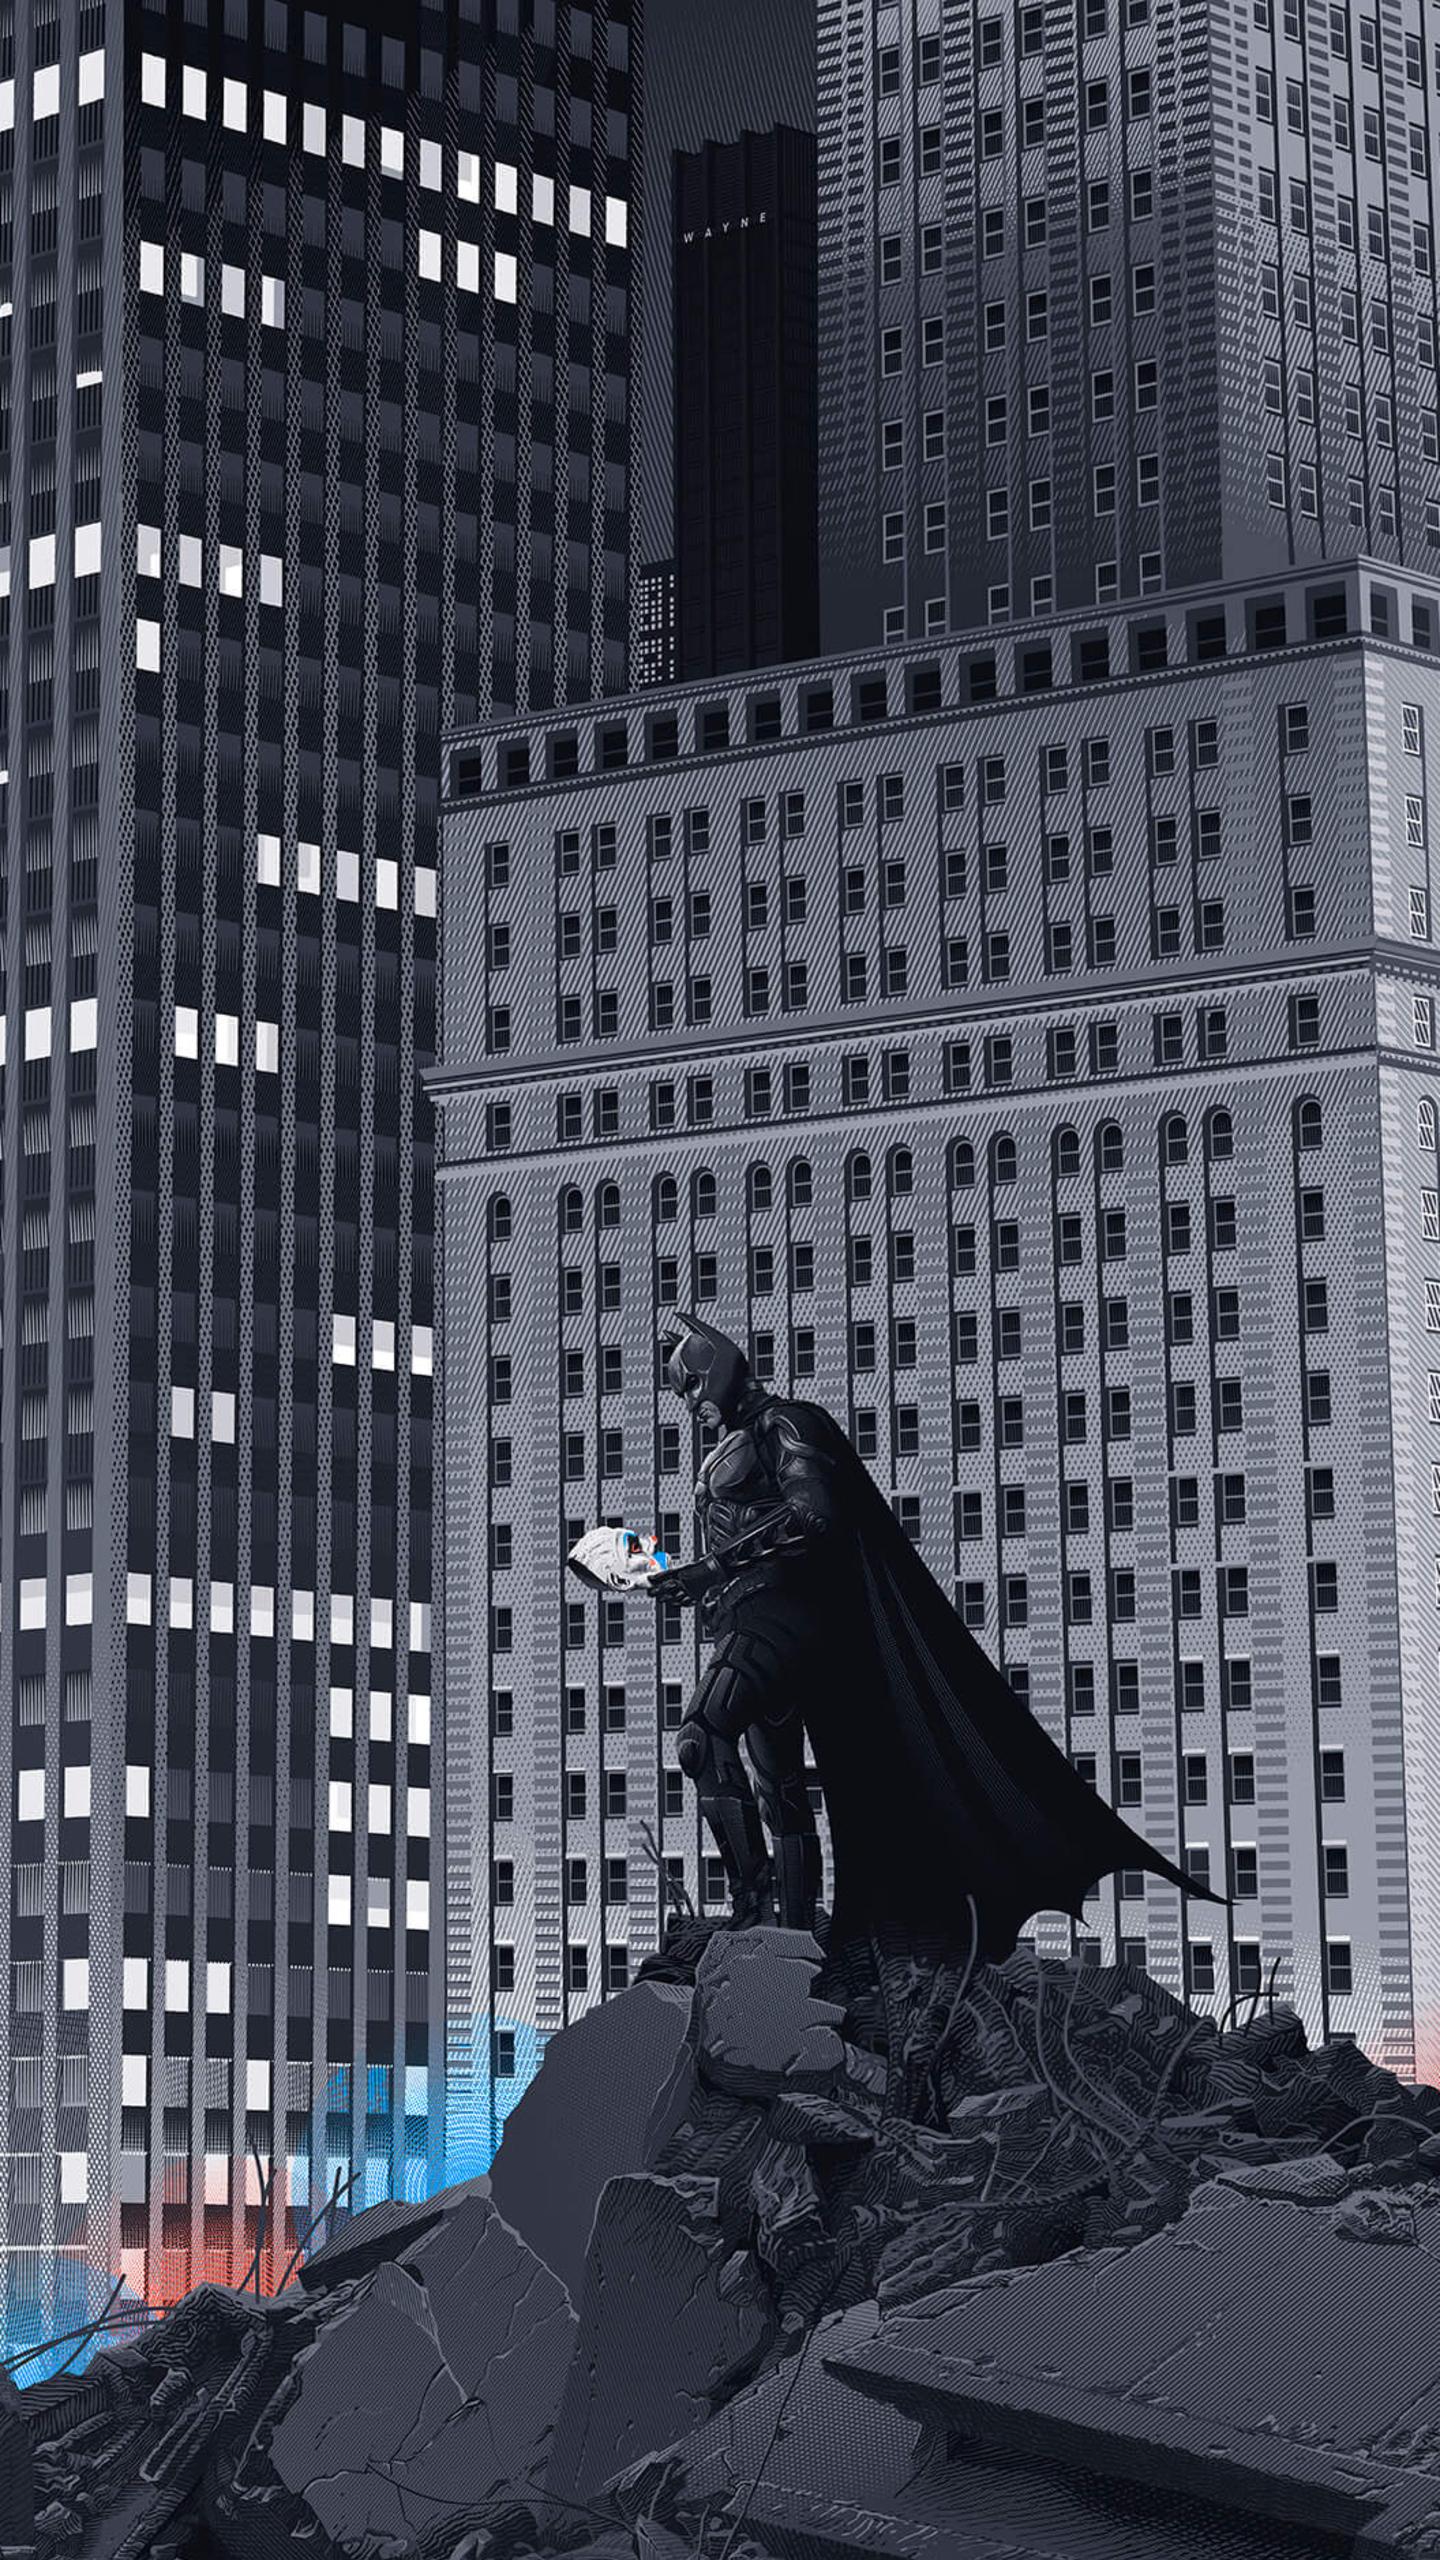 batman-superhero-comic-arts-1j.jpg